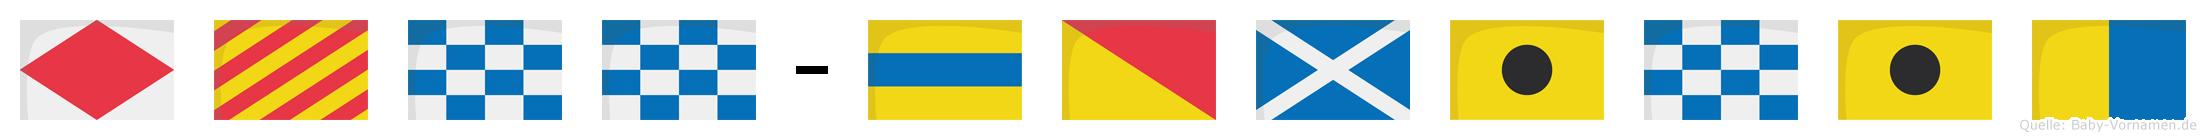 Fynn-Dominik im Flaggenalphabet